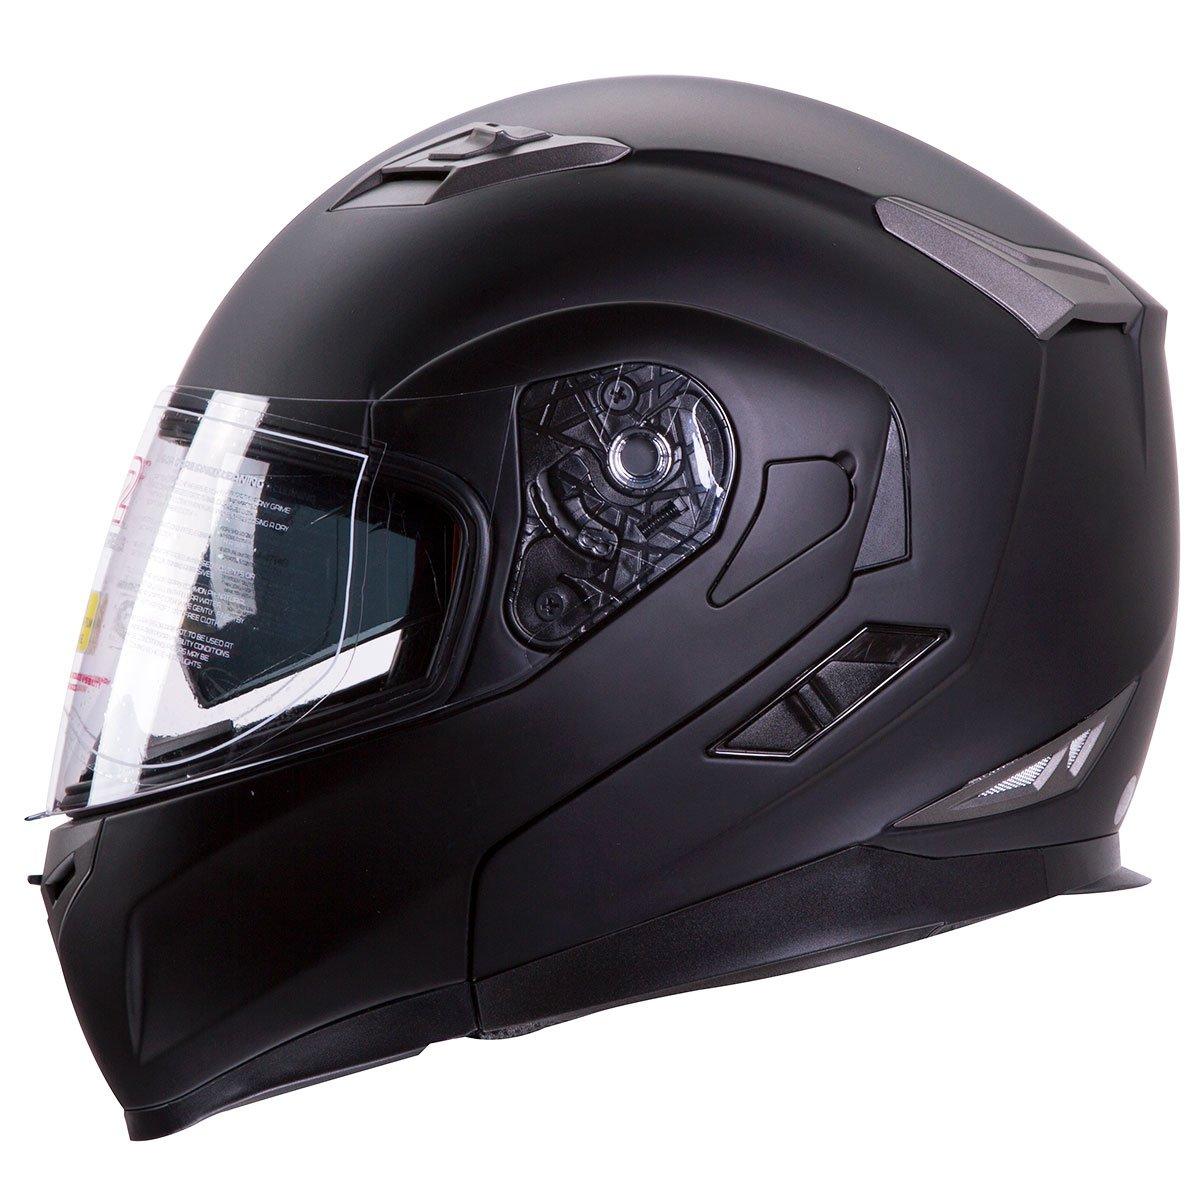 galleon iv2 helmet bluetooth combo model 953 dual. Black Bedroom Furniture Sets. Home Design Ideas